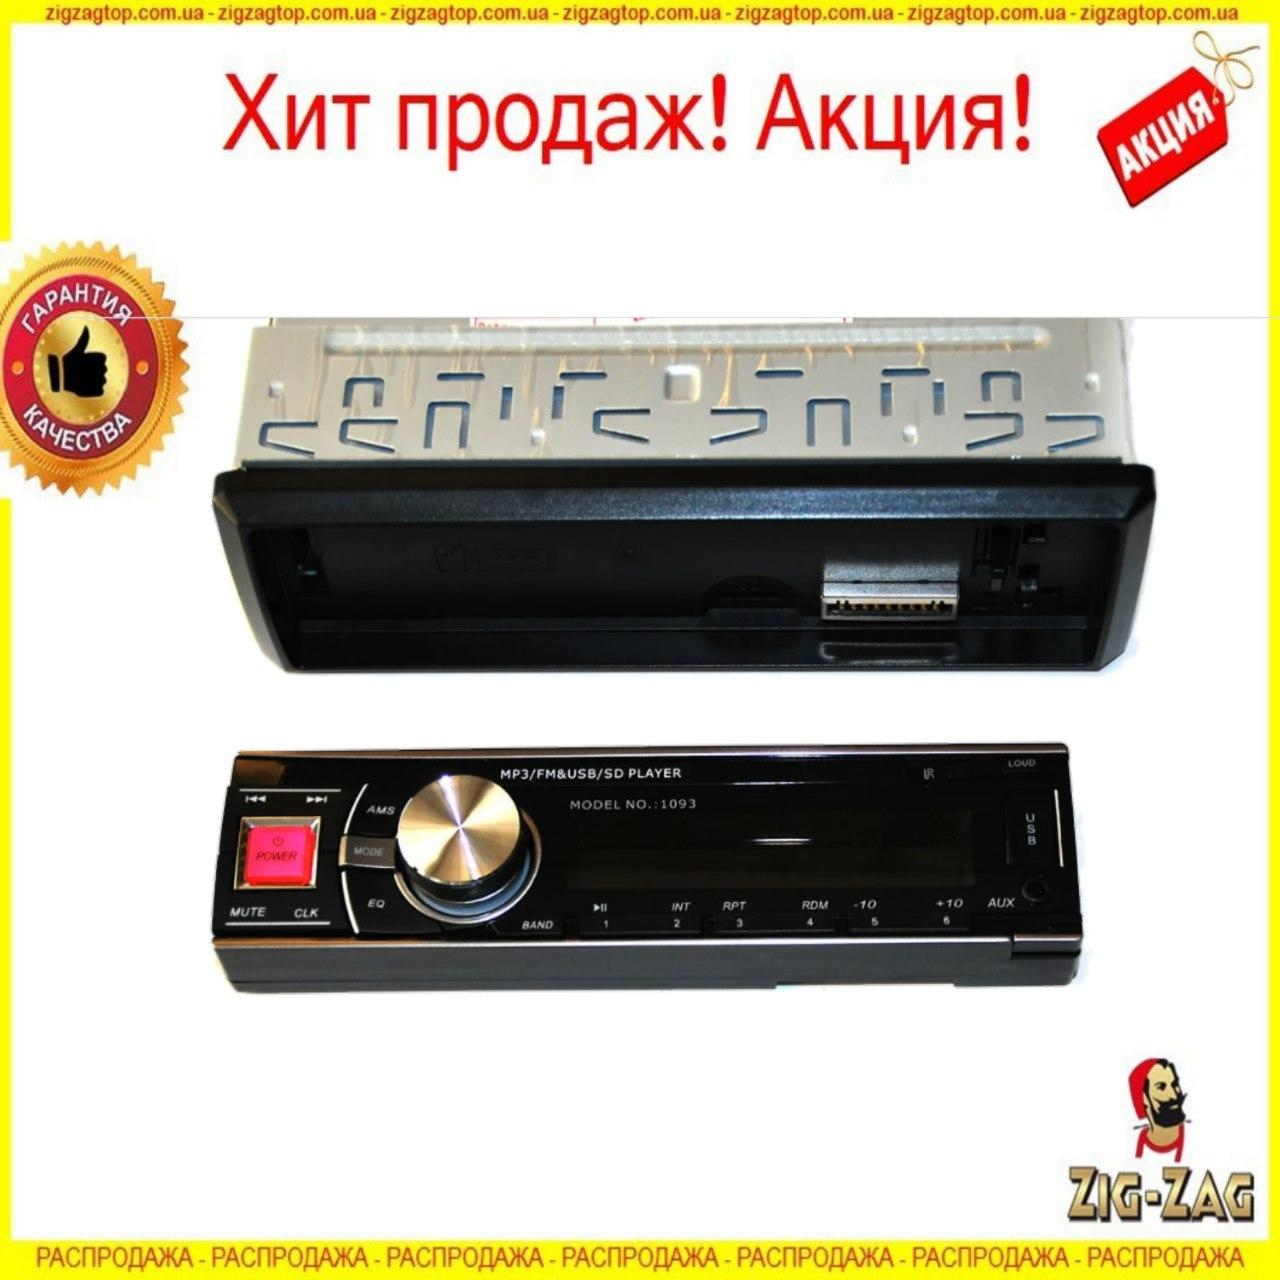 Автомагнитола 1DIN Pioneer MP3 1093 с Пультом магнитола Пионер МП3 в Машину Авто USB И BLUETOOTH Блютуз